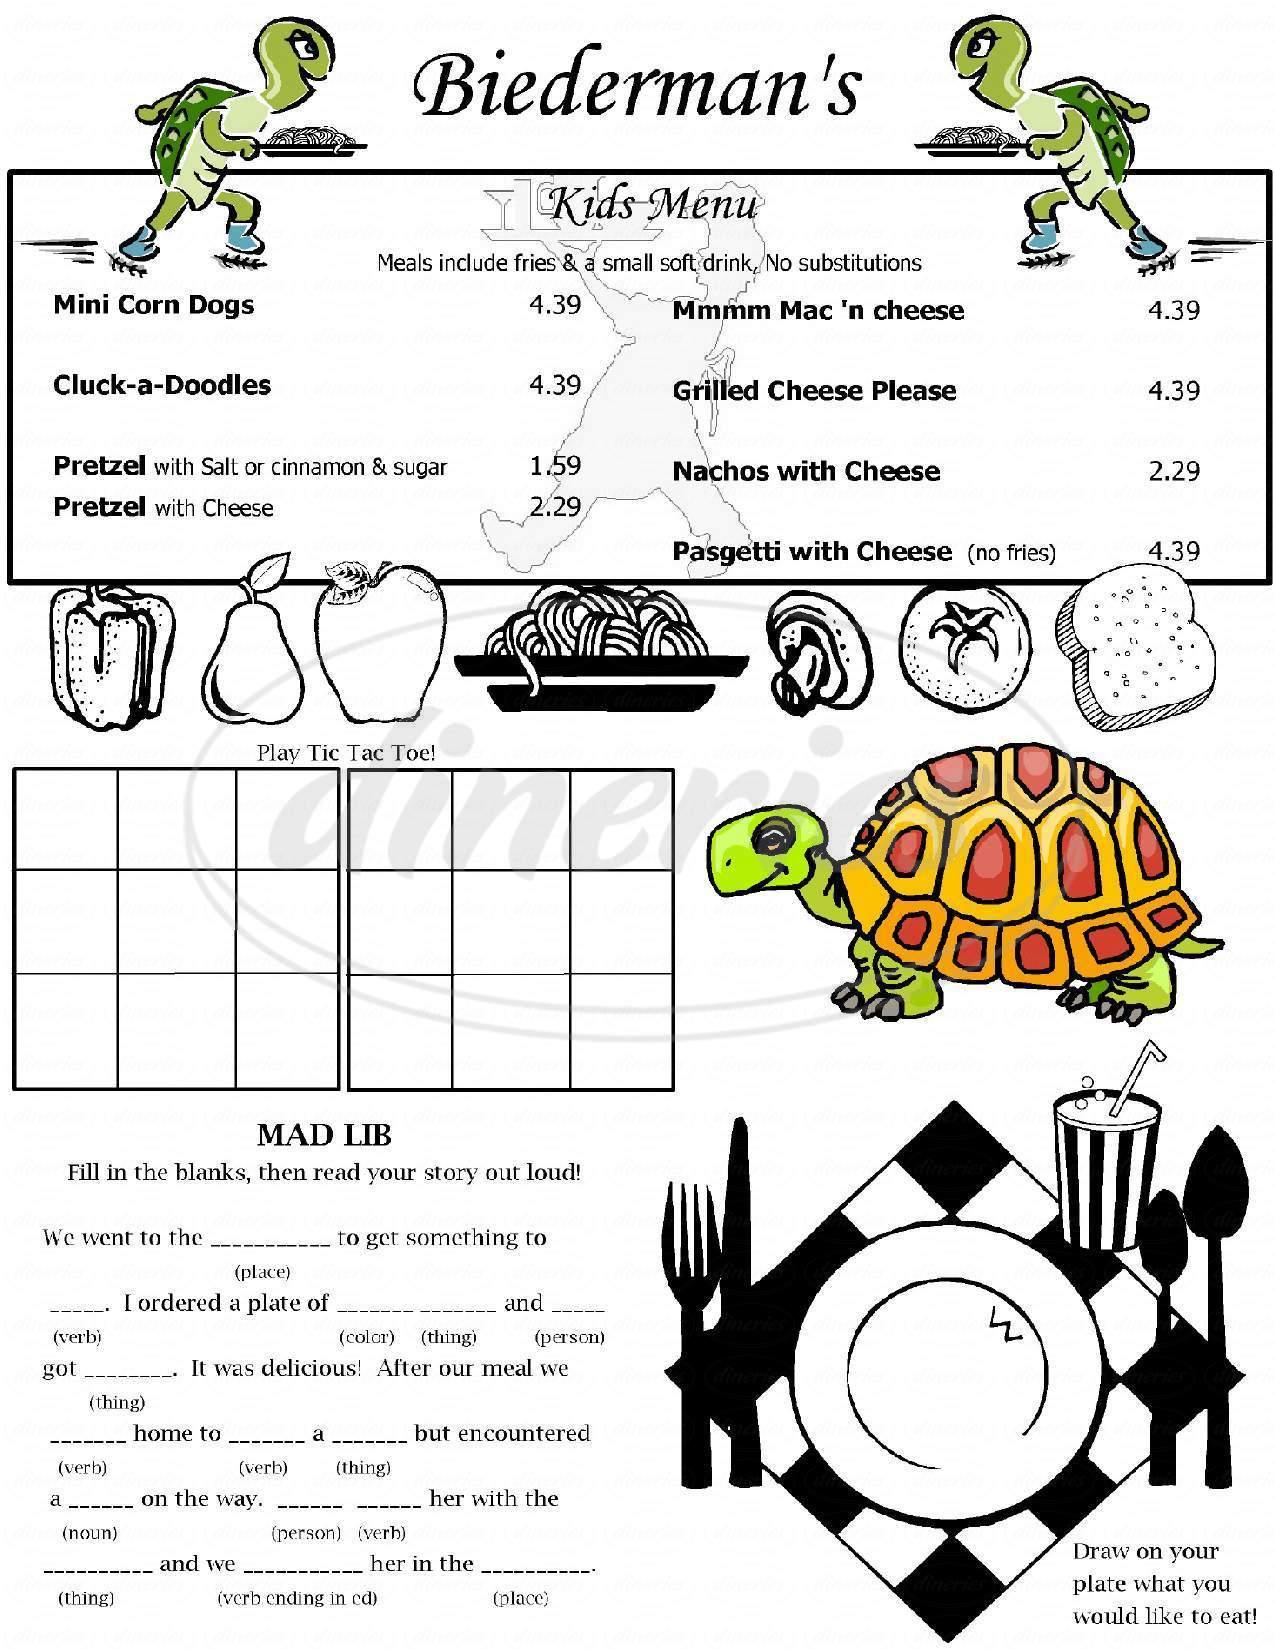 menu for Biederman's Bistro & Catering